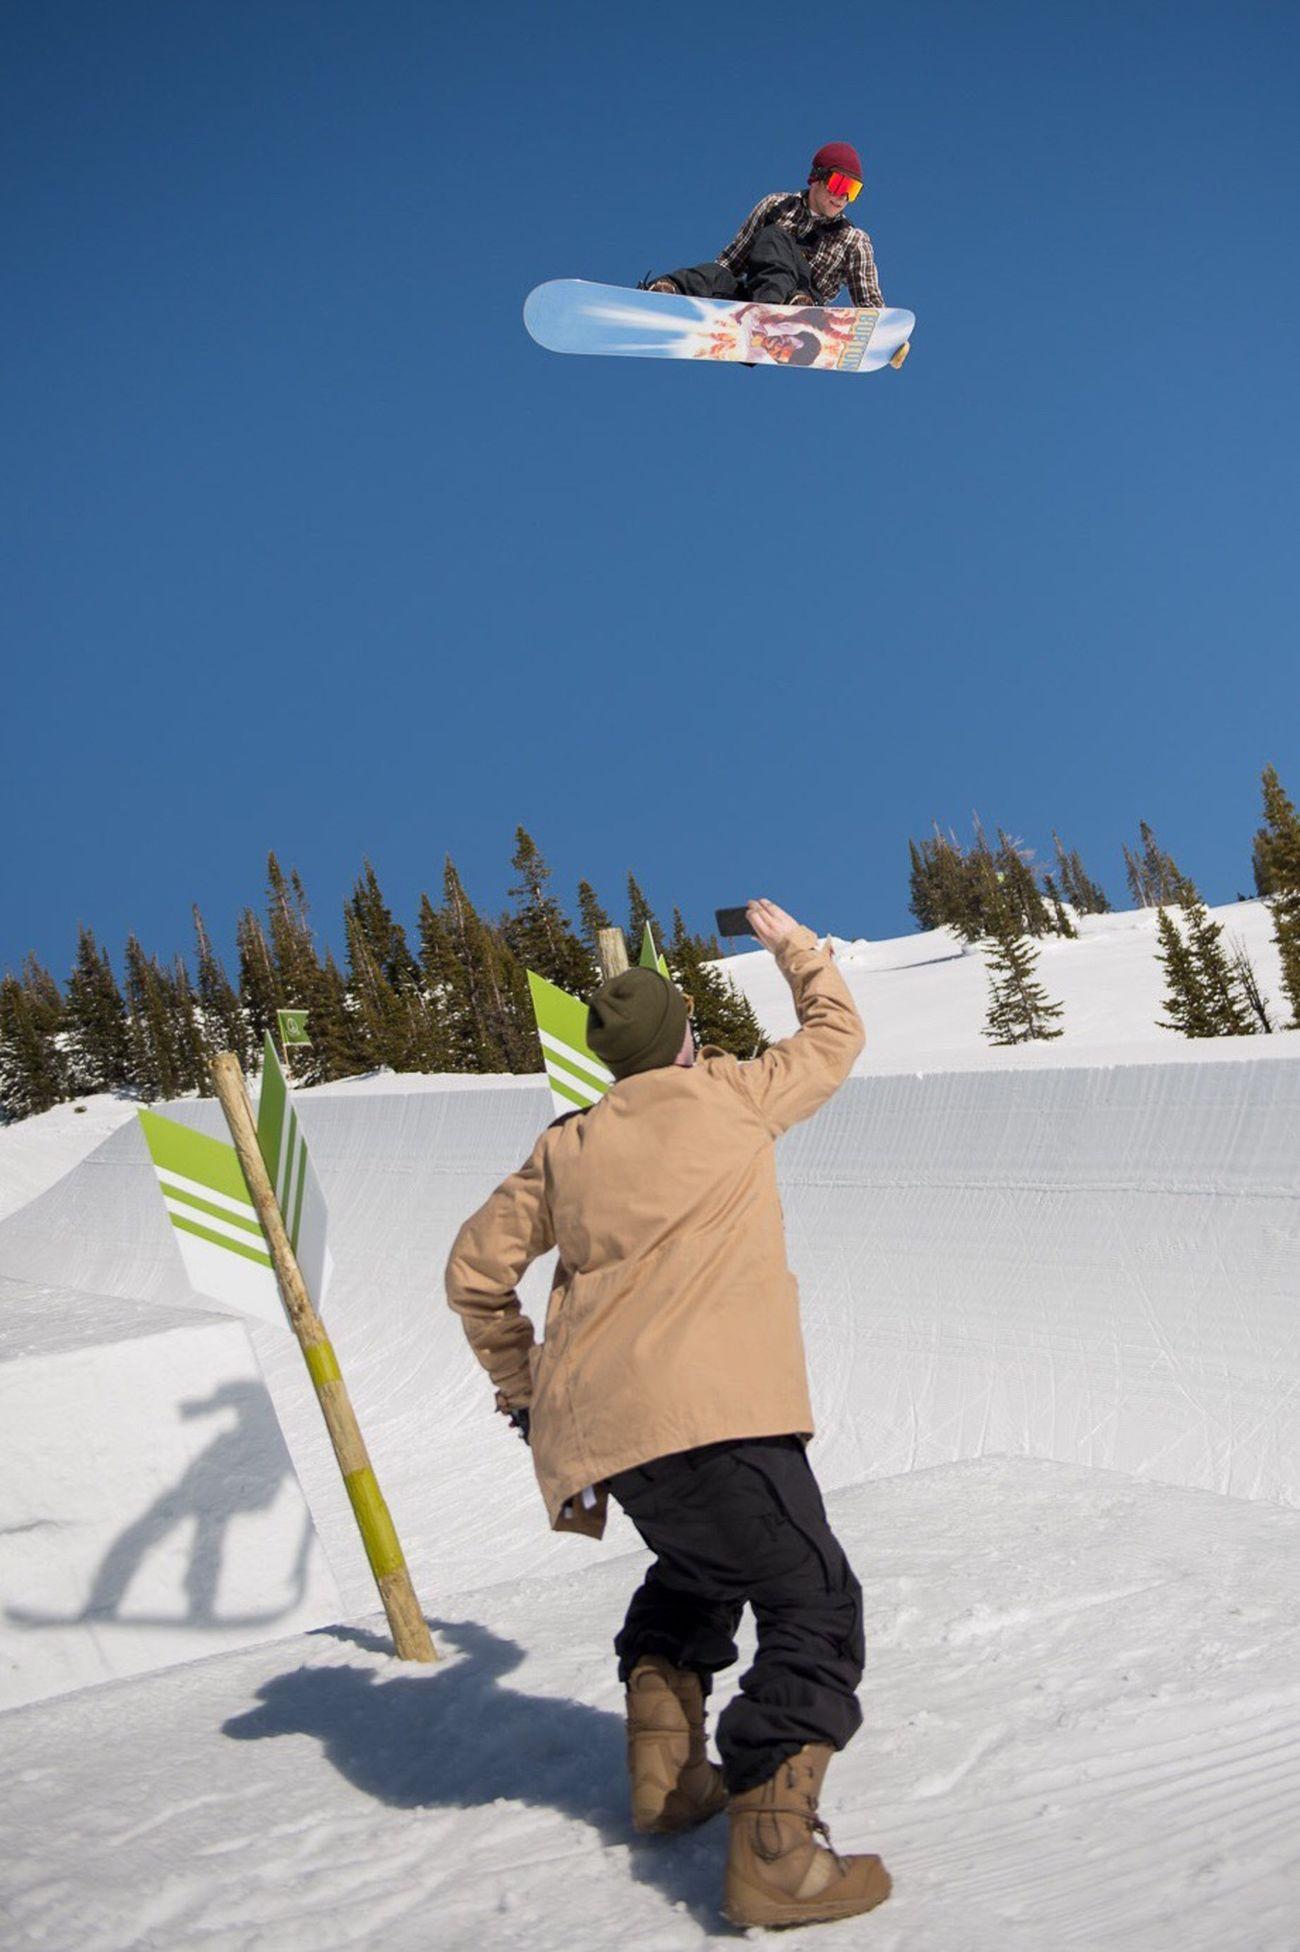 Peacepark Benferguson riding Trevorandrew nabbing the mobile phone image Wyoming Grand Targhee Snowboarding